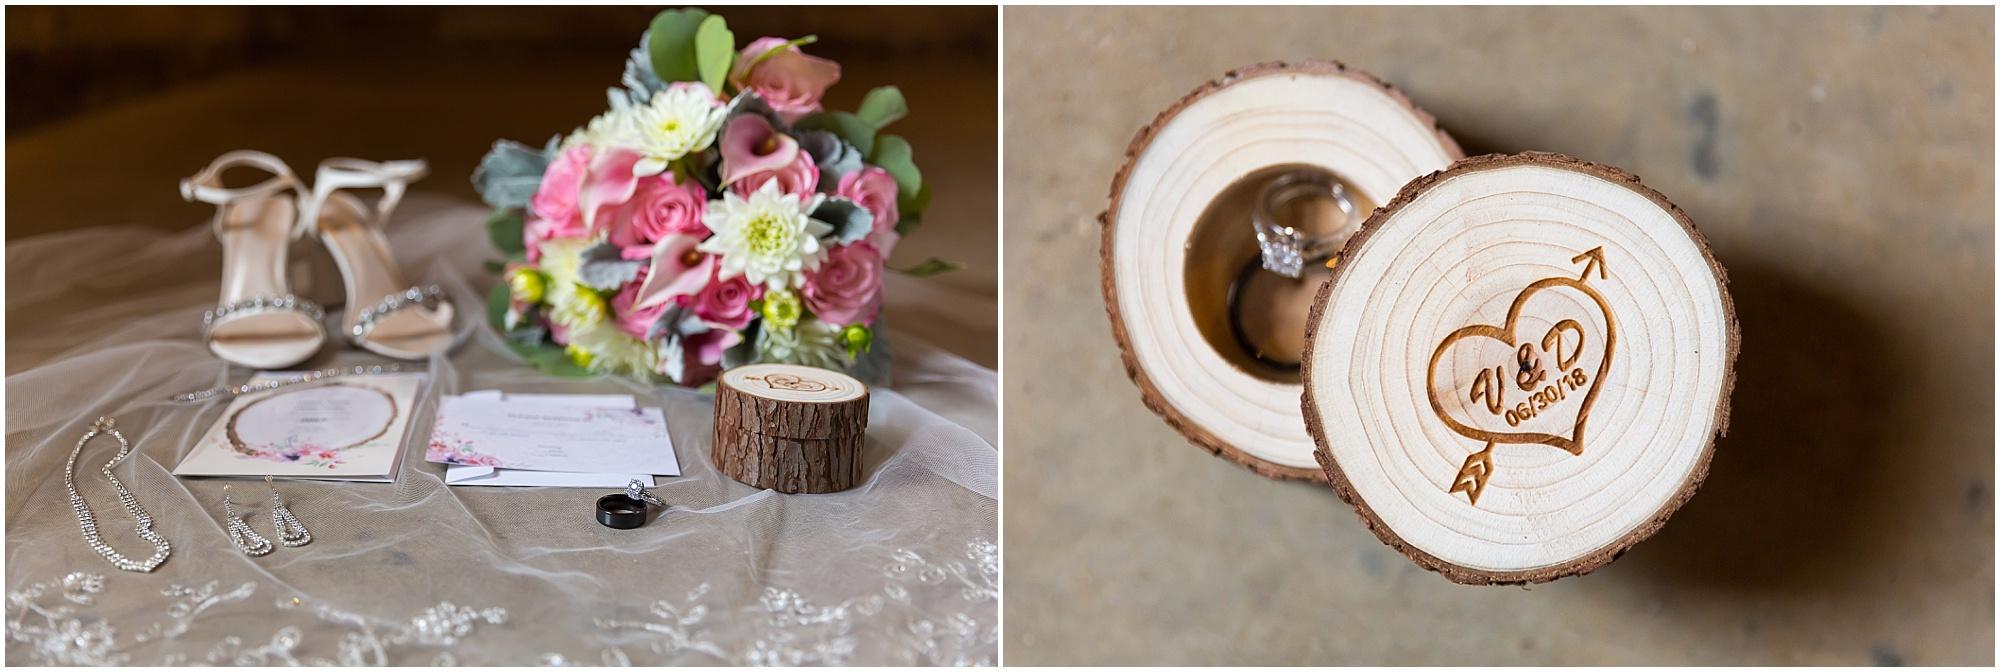 Rustic wedding details, wooden ring box - Jason & Melaina Photography